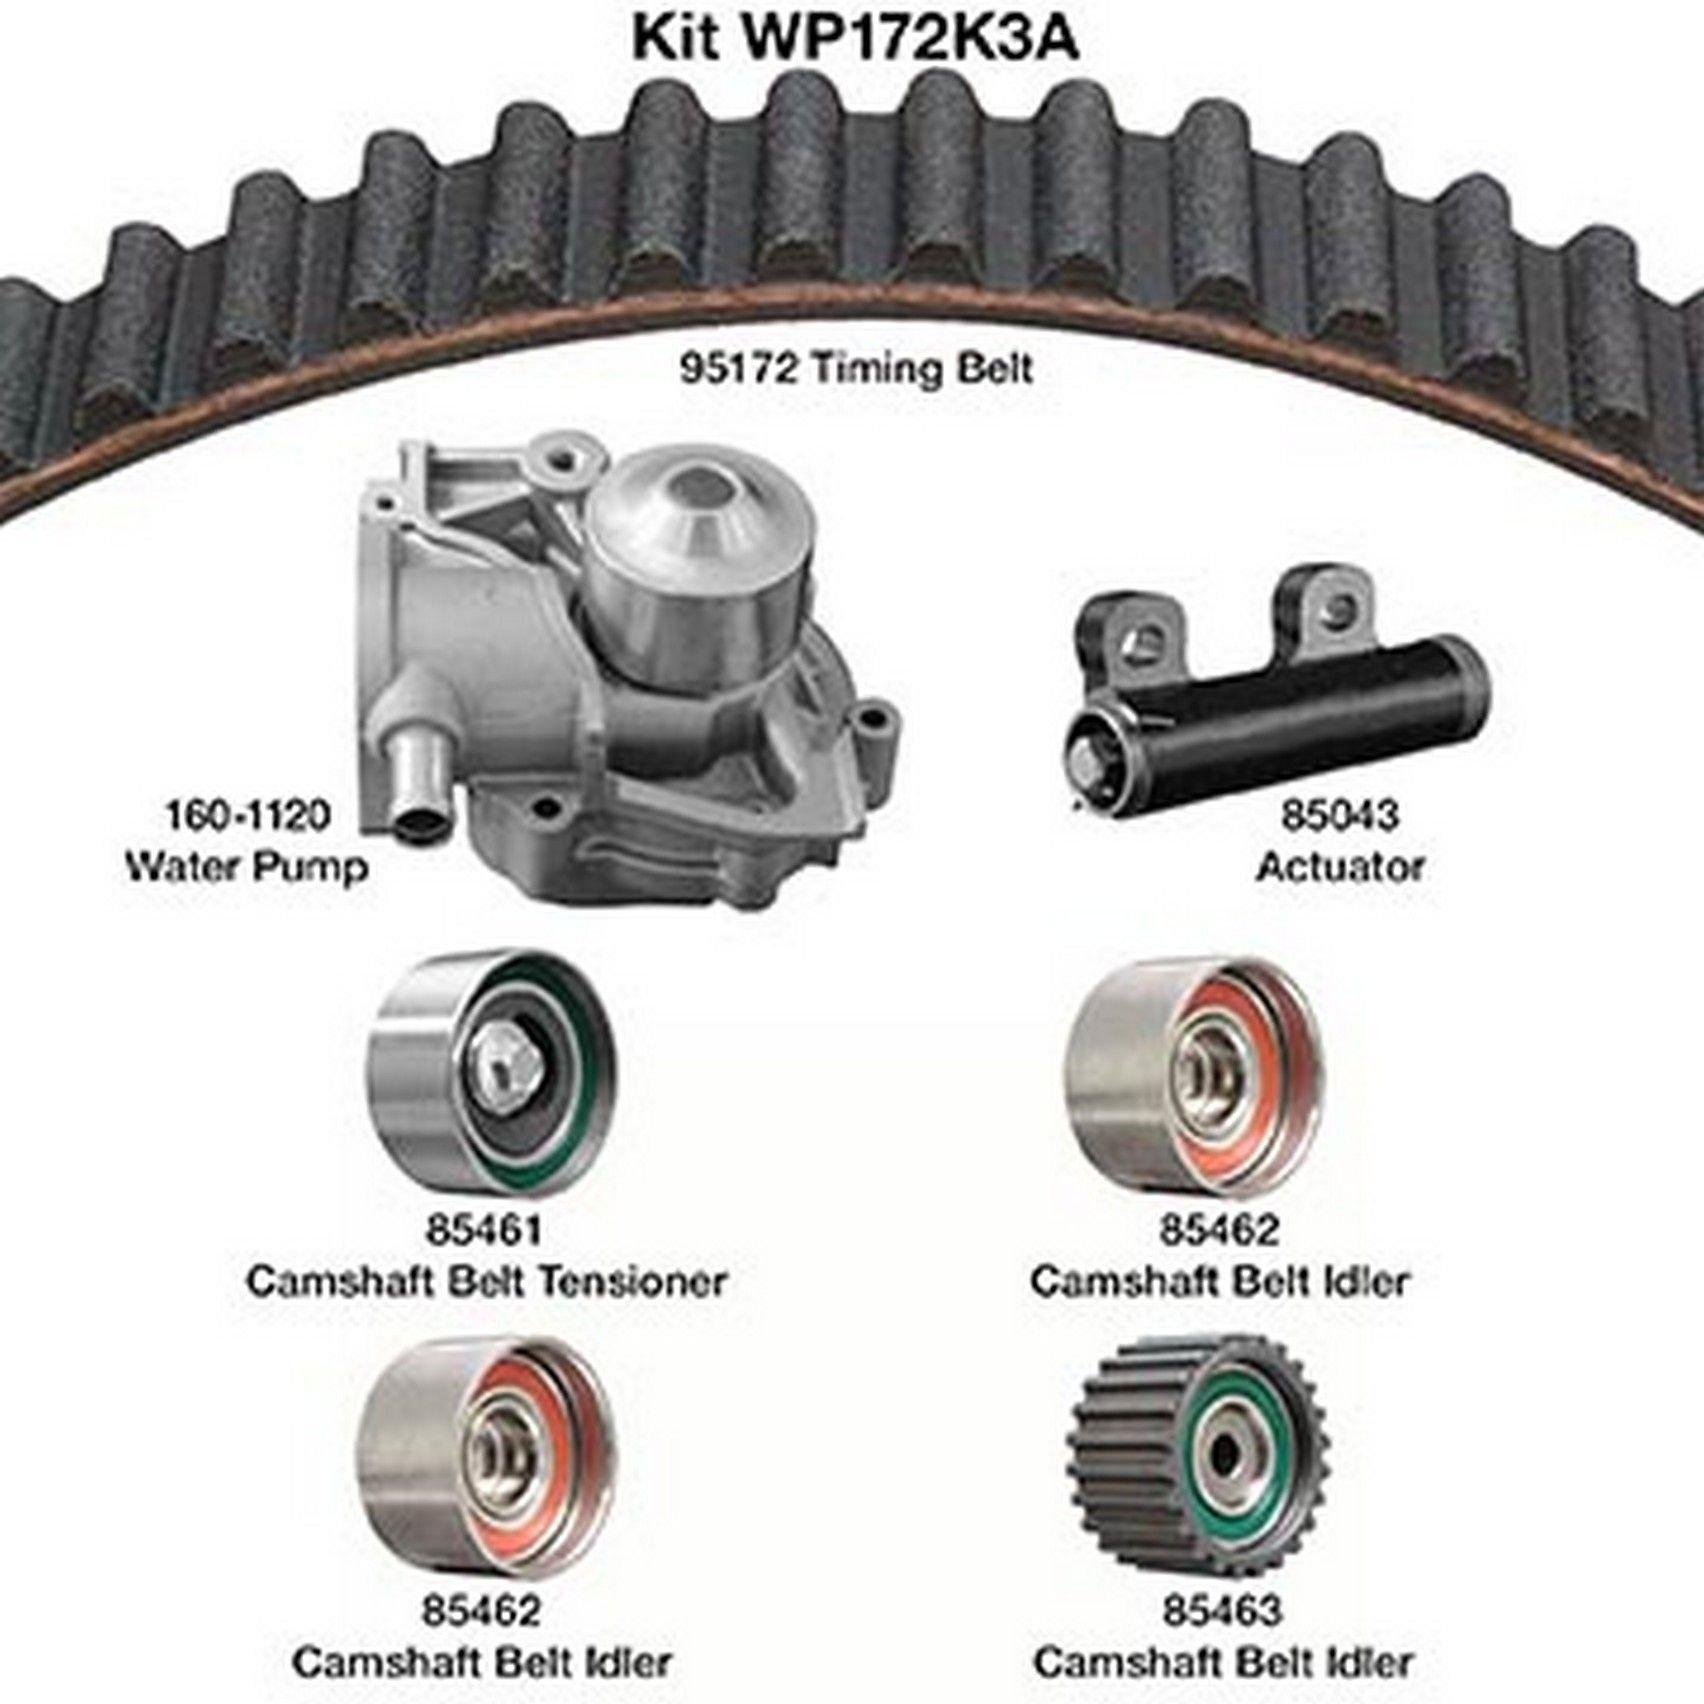 Subaru Impreza Engine Timing Belt Kit with Water Pump Replacement